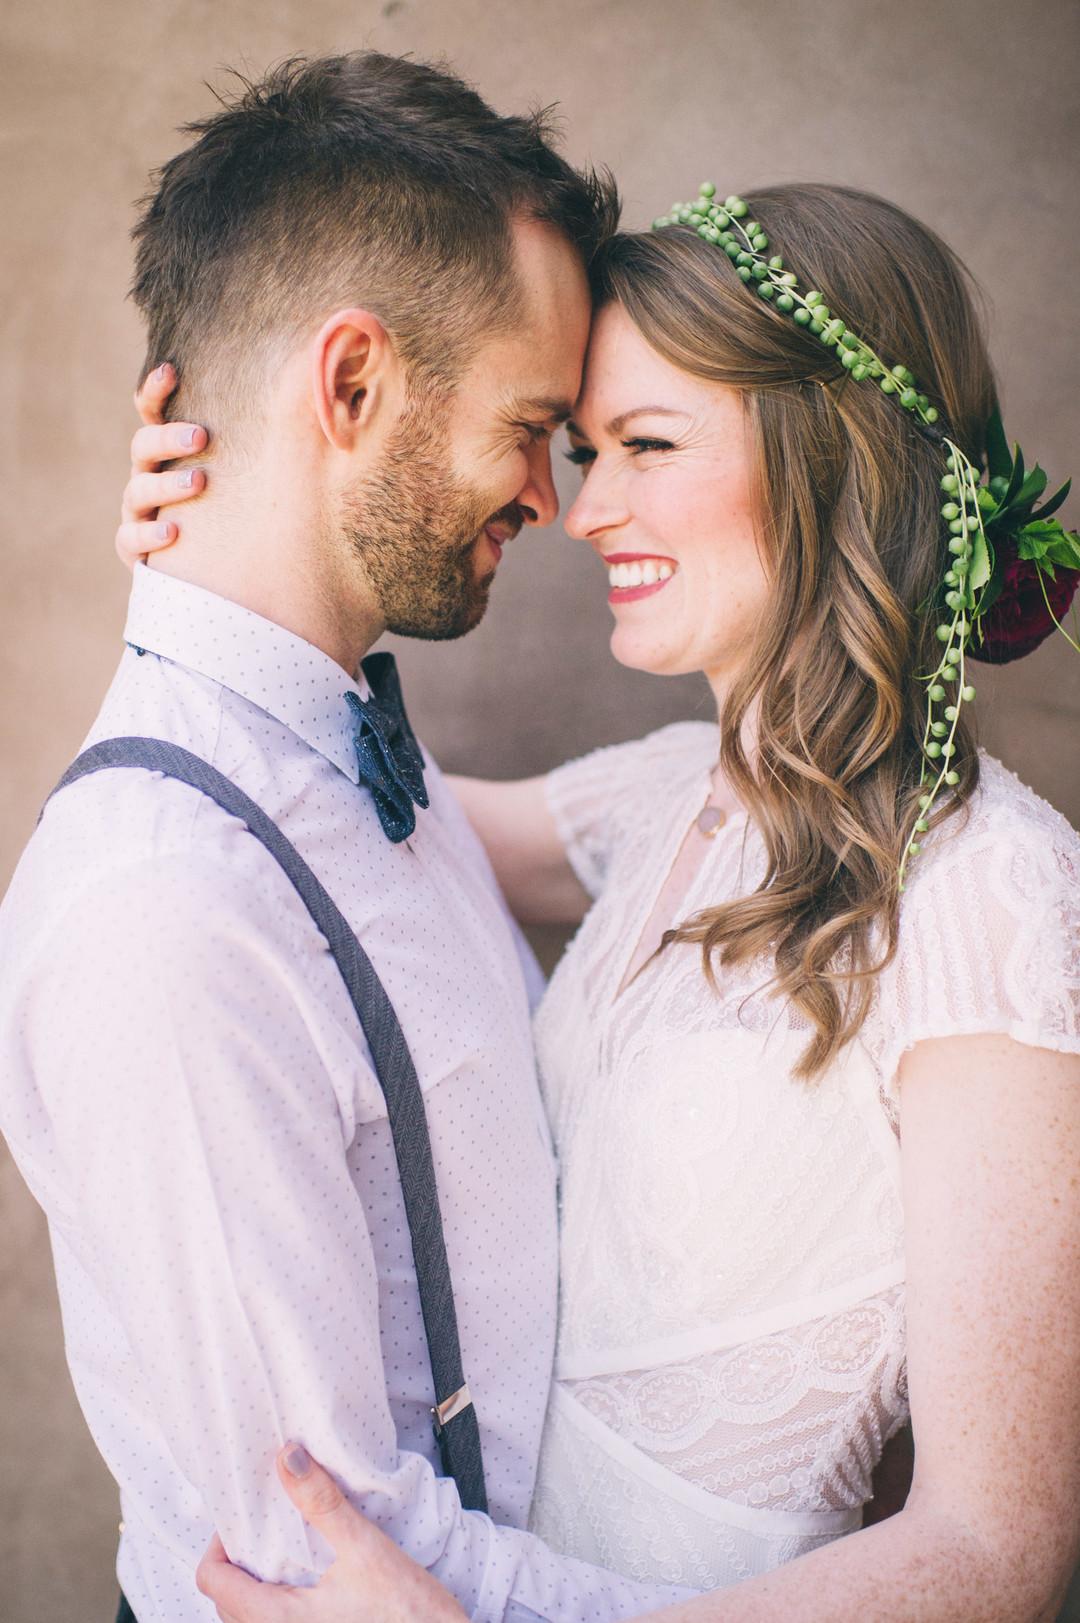 www.santabarbarawedding.com | Sarah Katherine Davis Photography | Santa Barbara Museum of Natural History | Wild Heart Events | BHLDN | Pretty Please Beauty | Bride and Groom Share a Moment